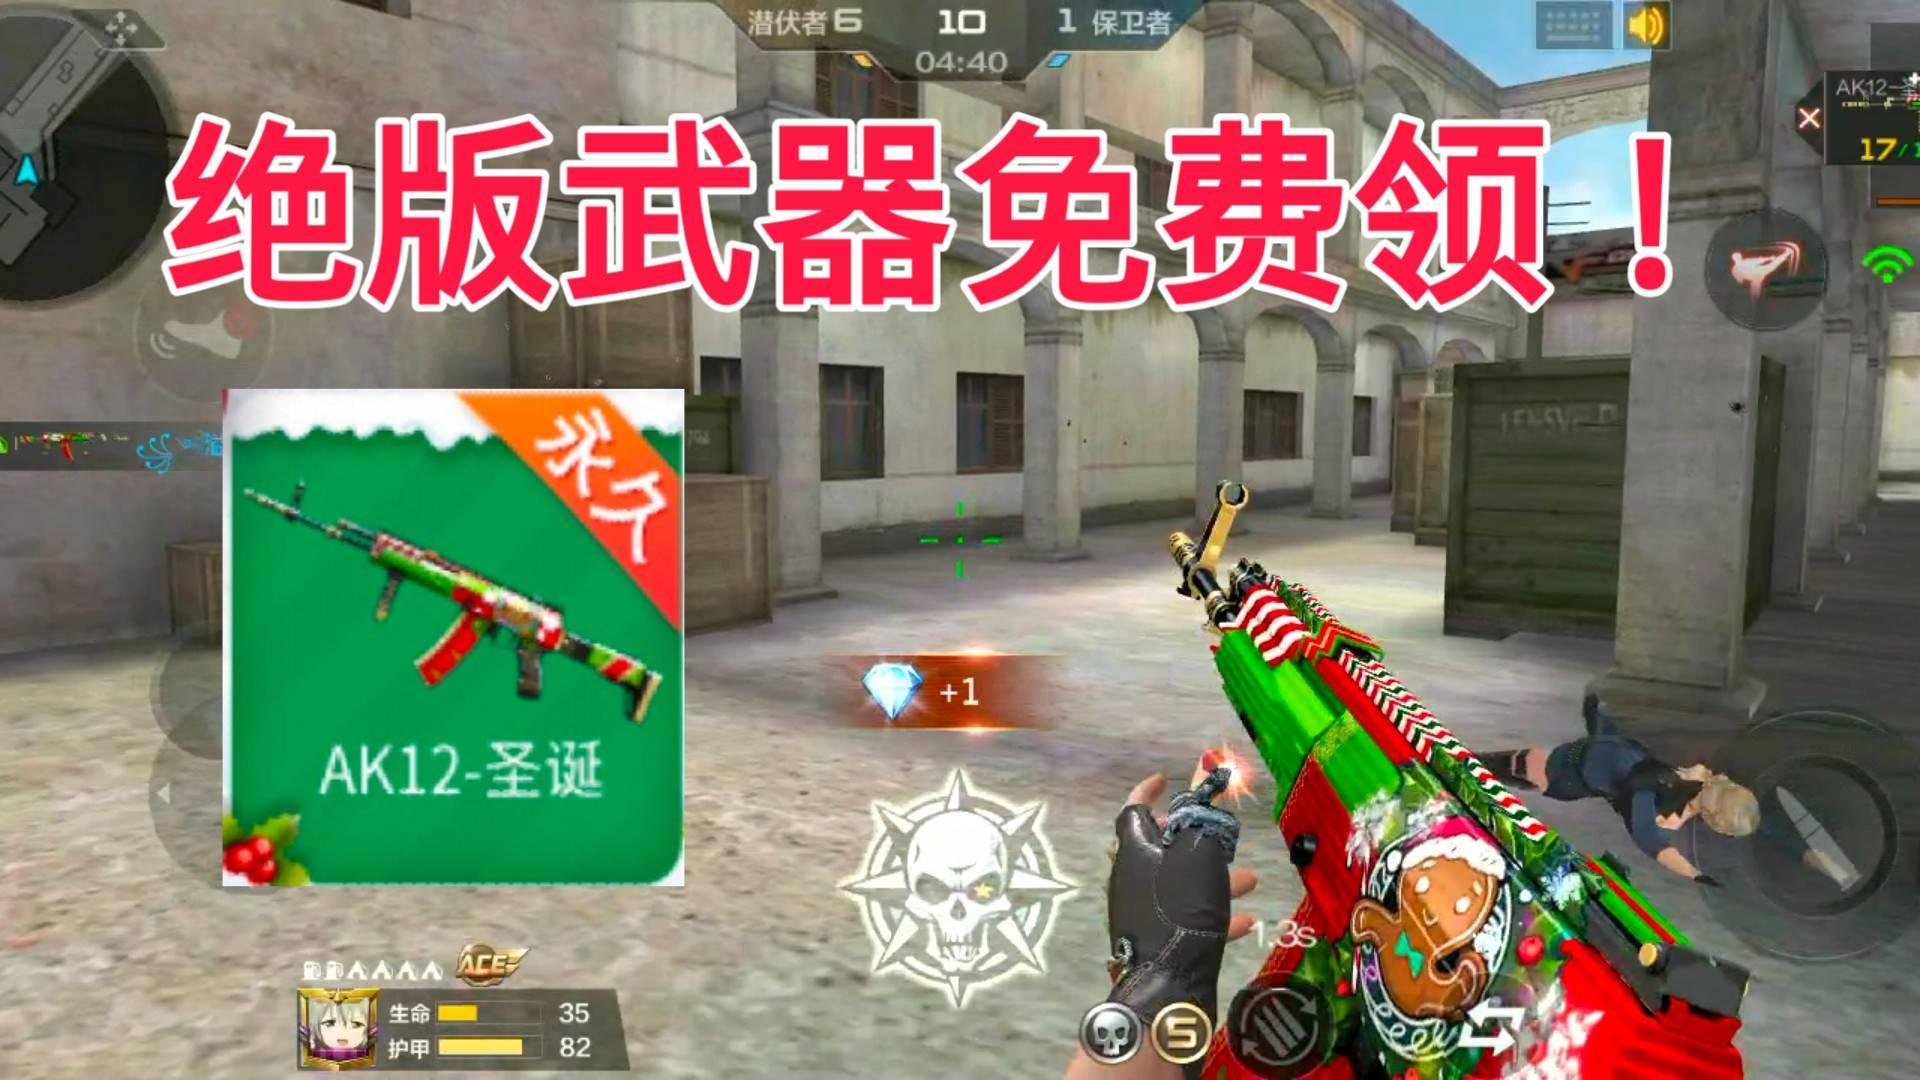 CF手游柿子:AK12-圣诞终于返场了,集齐积分免费领永久!